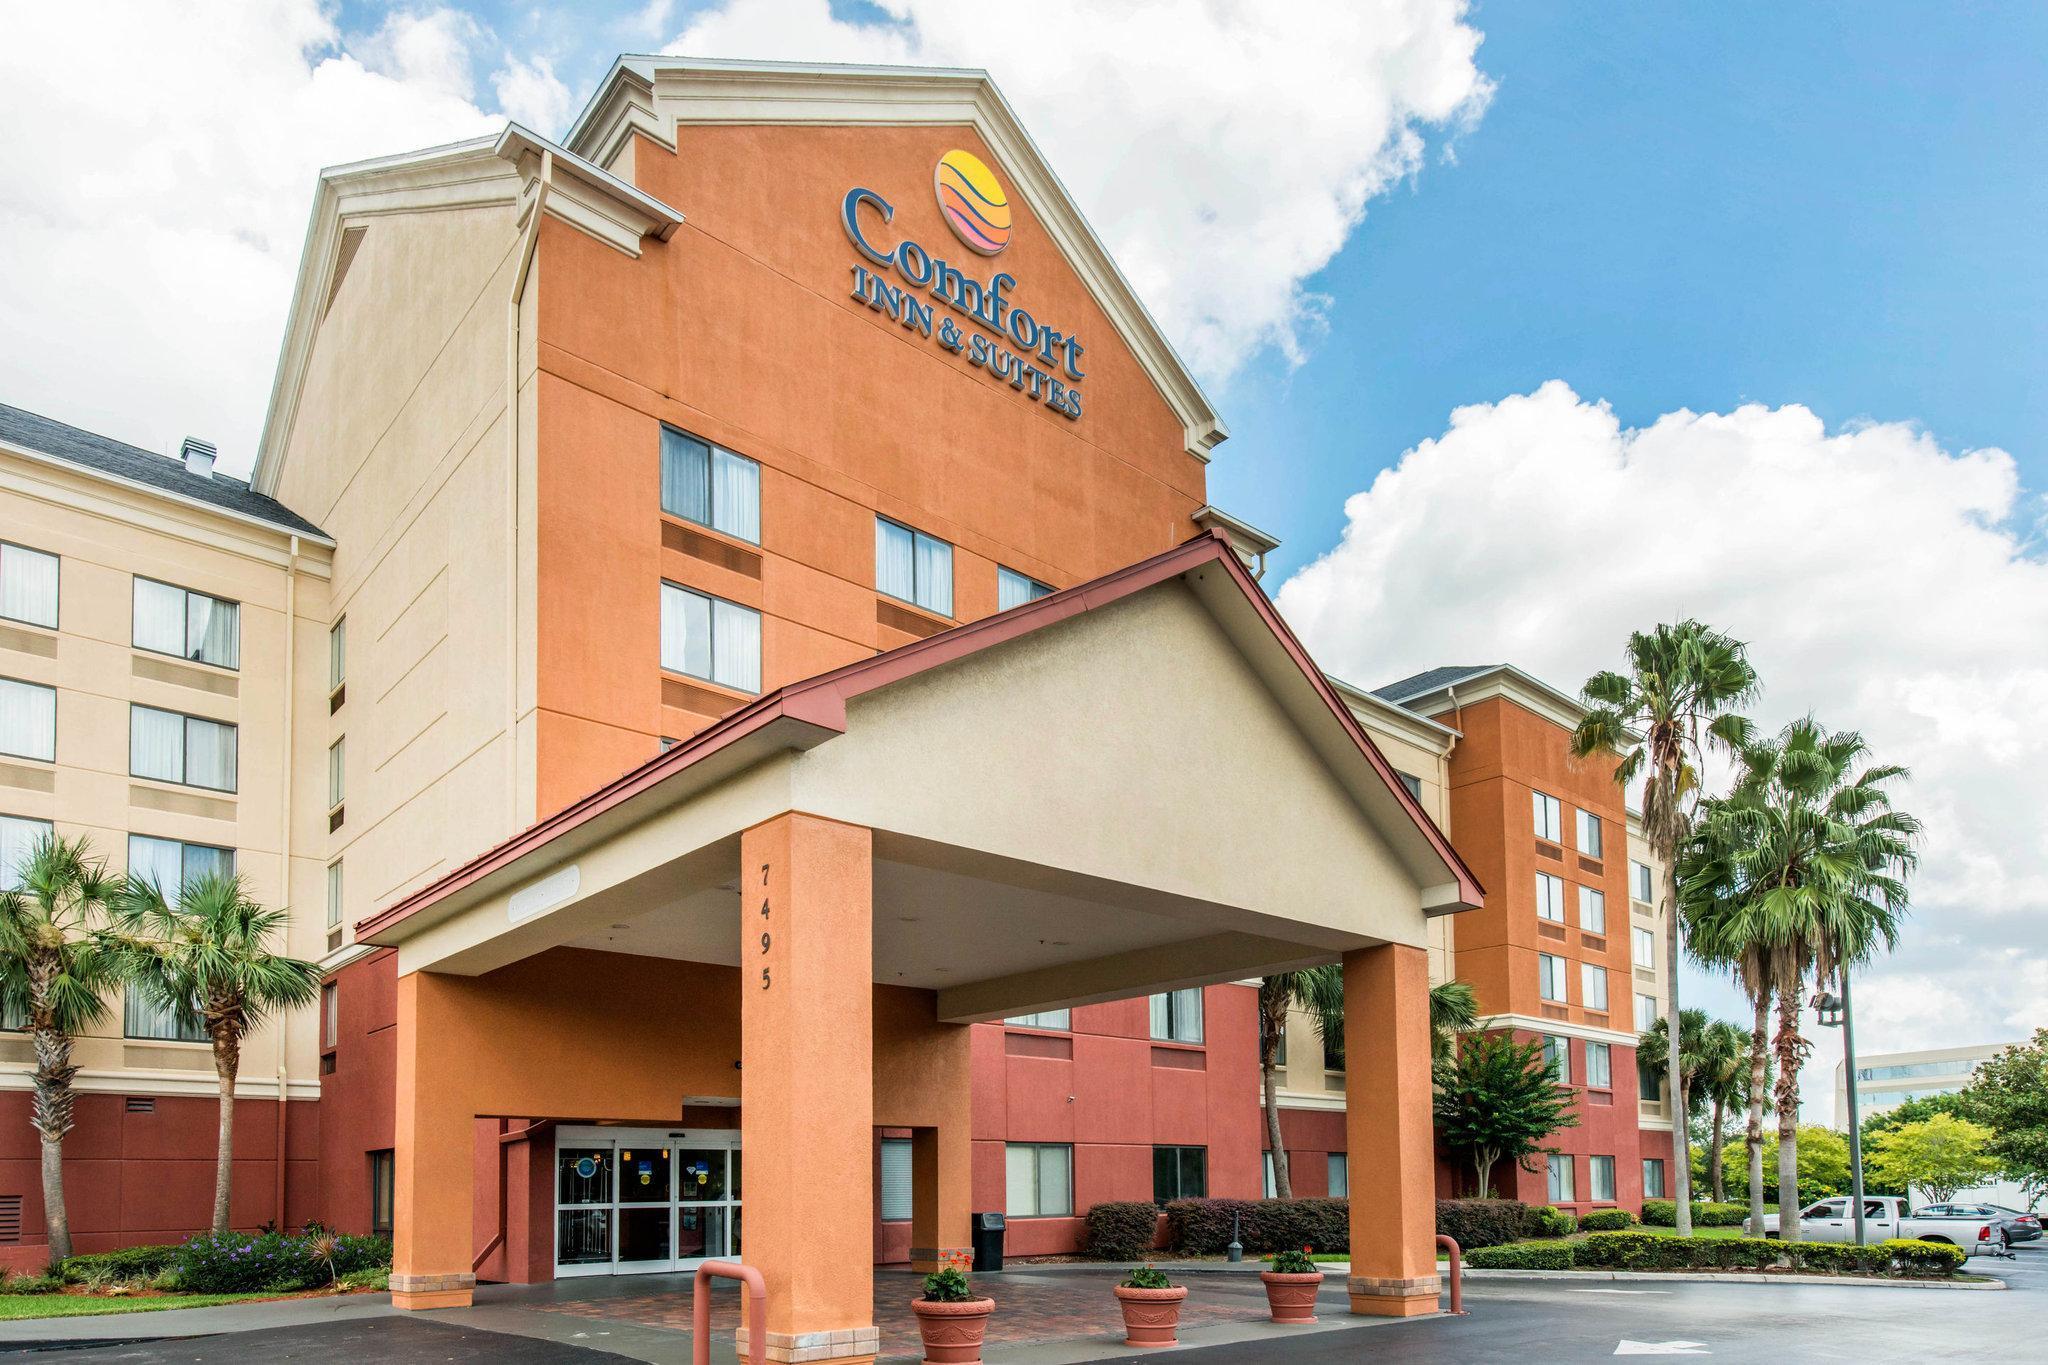 Comfort Inn And Suites Near Universal Orlando Resort